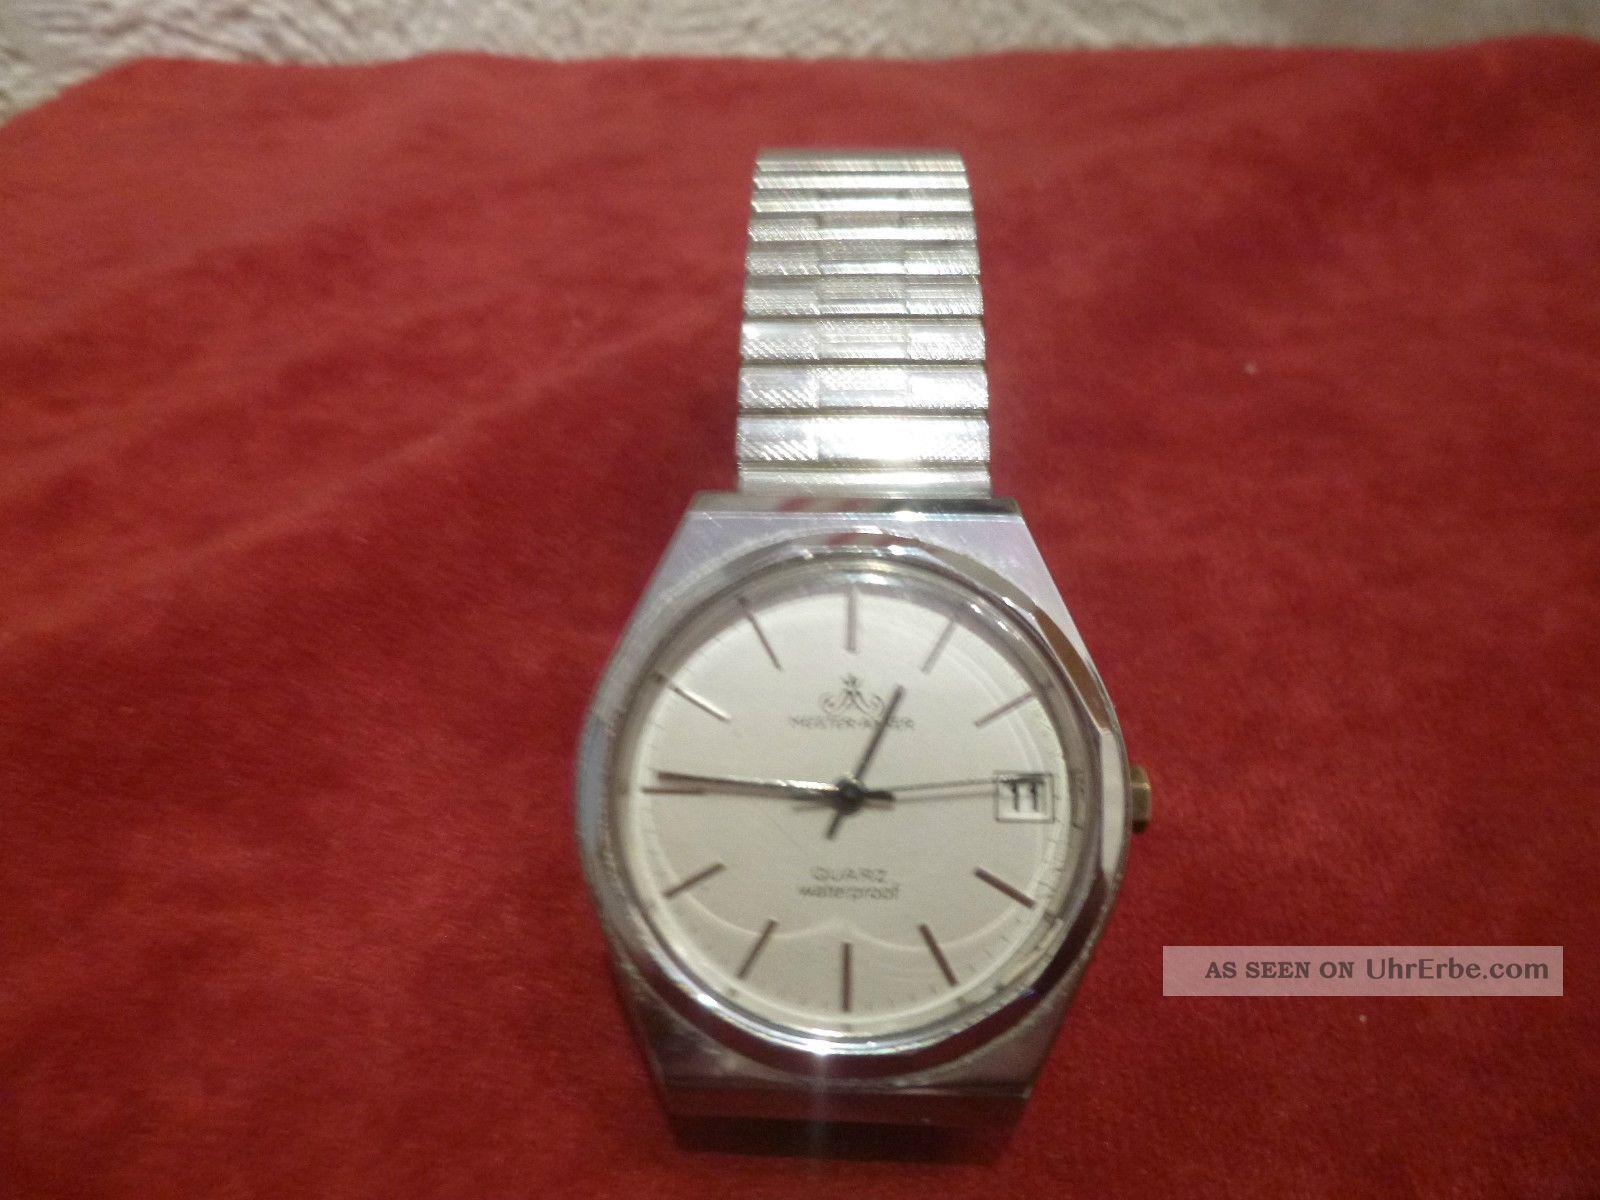 Meister - Anker Quartz Armbanduhr Flexband Armbanduhren Bild